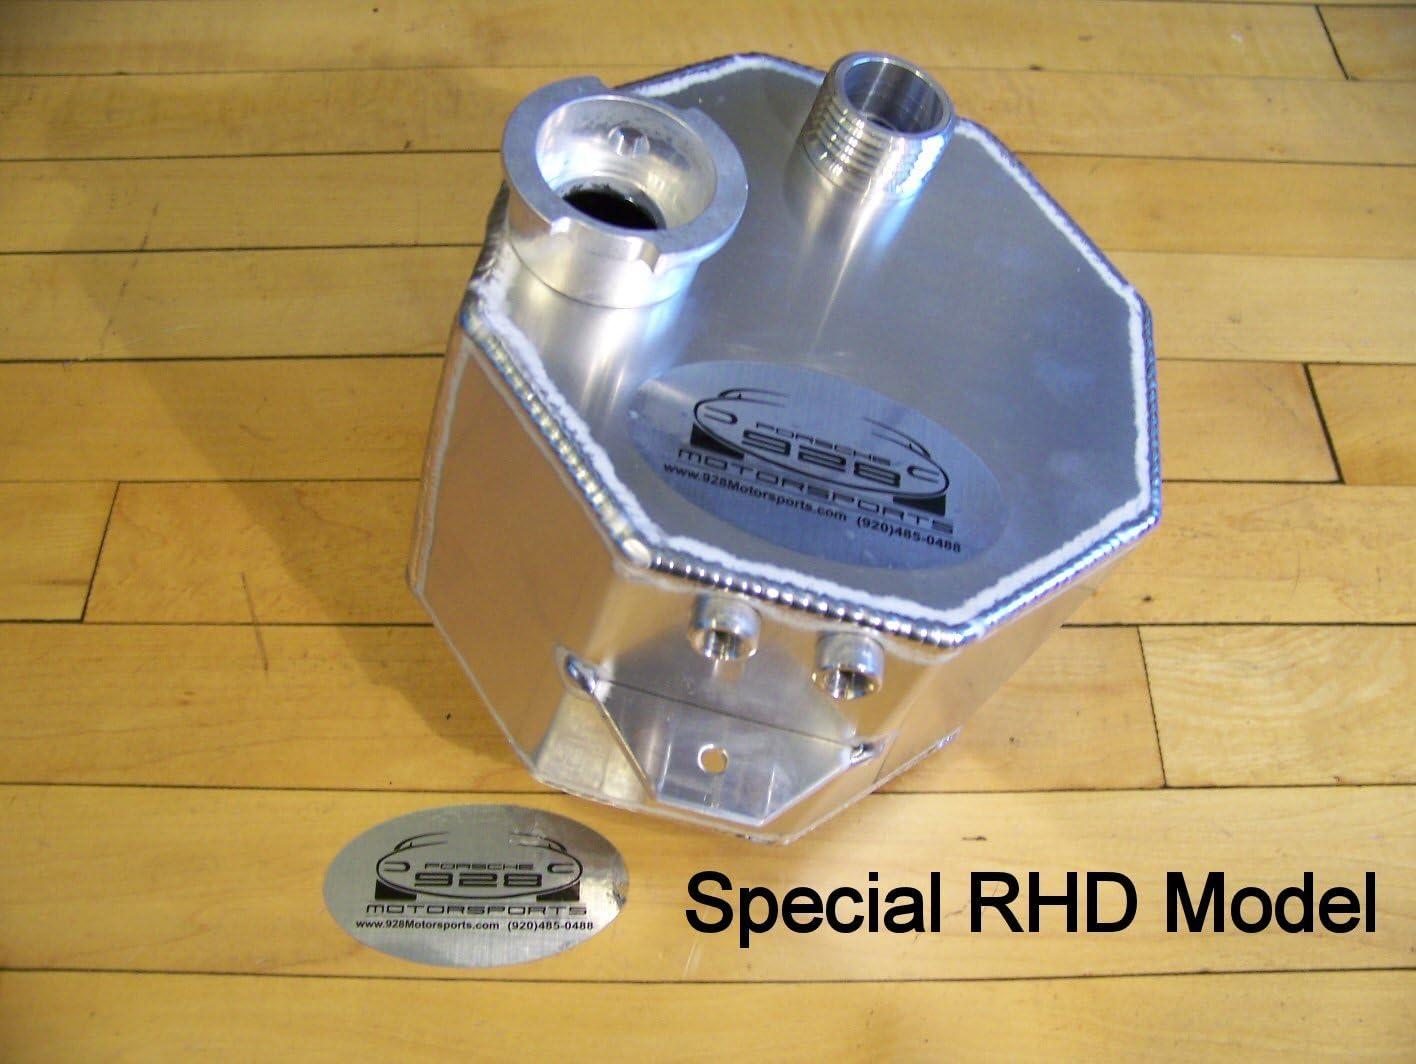 New Coolant Reservoir for RHD Porsche 928